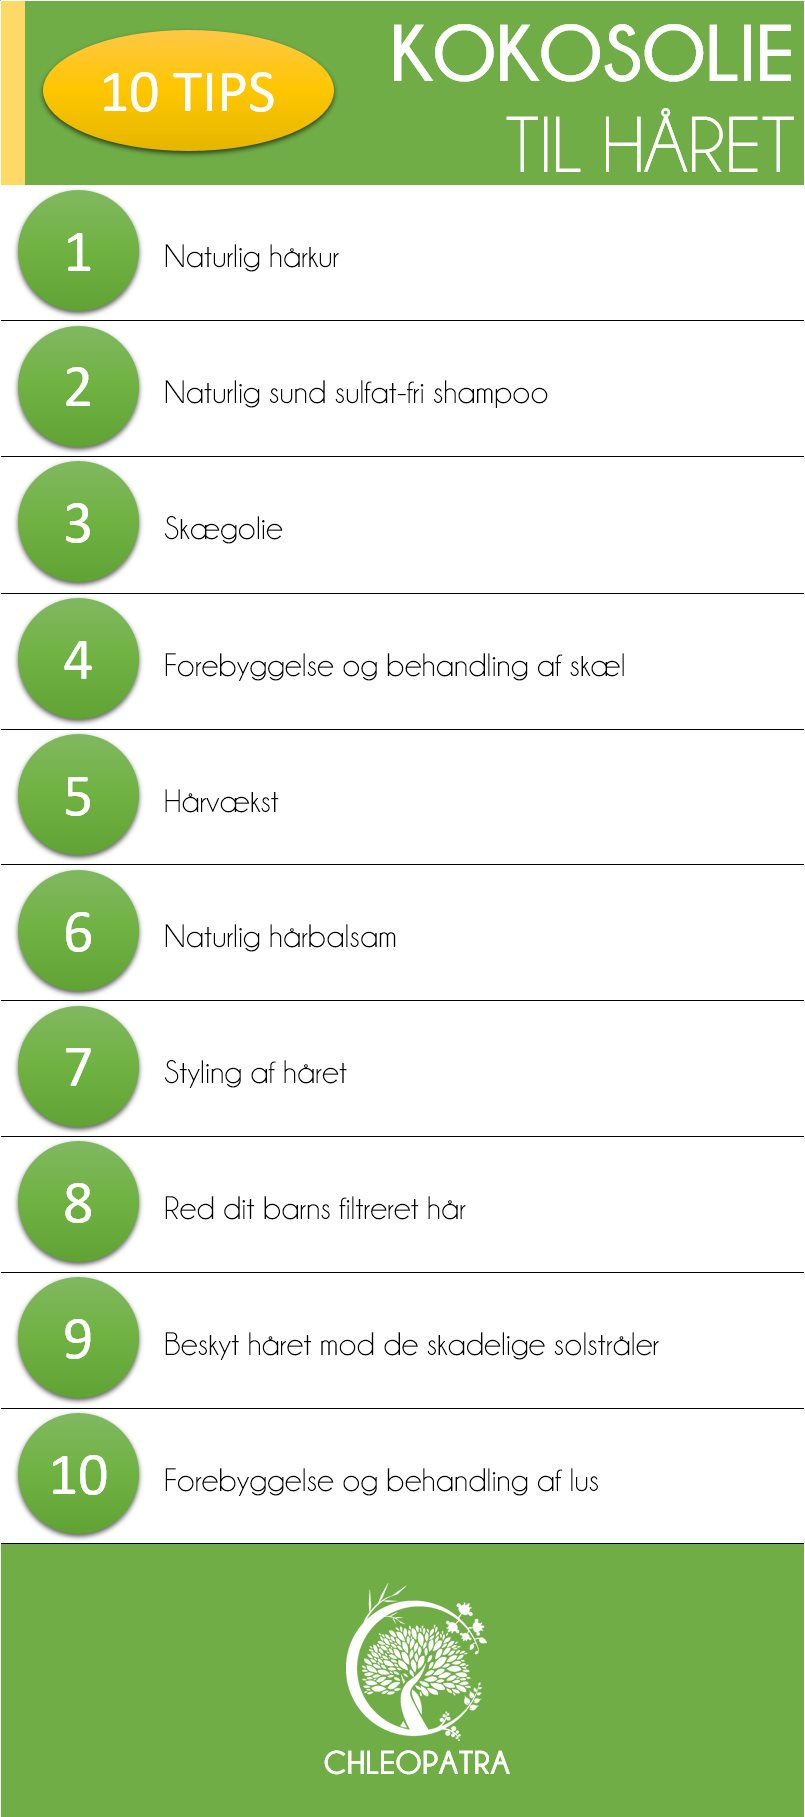 kokosolie til håret - 10 tips infografik